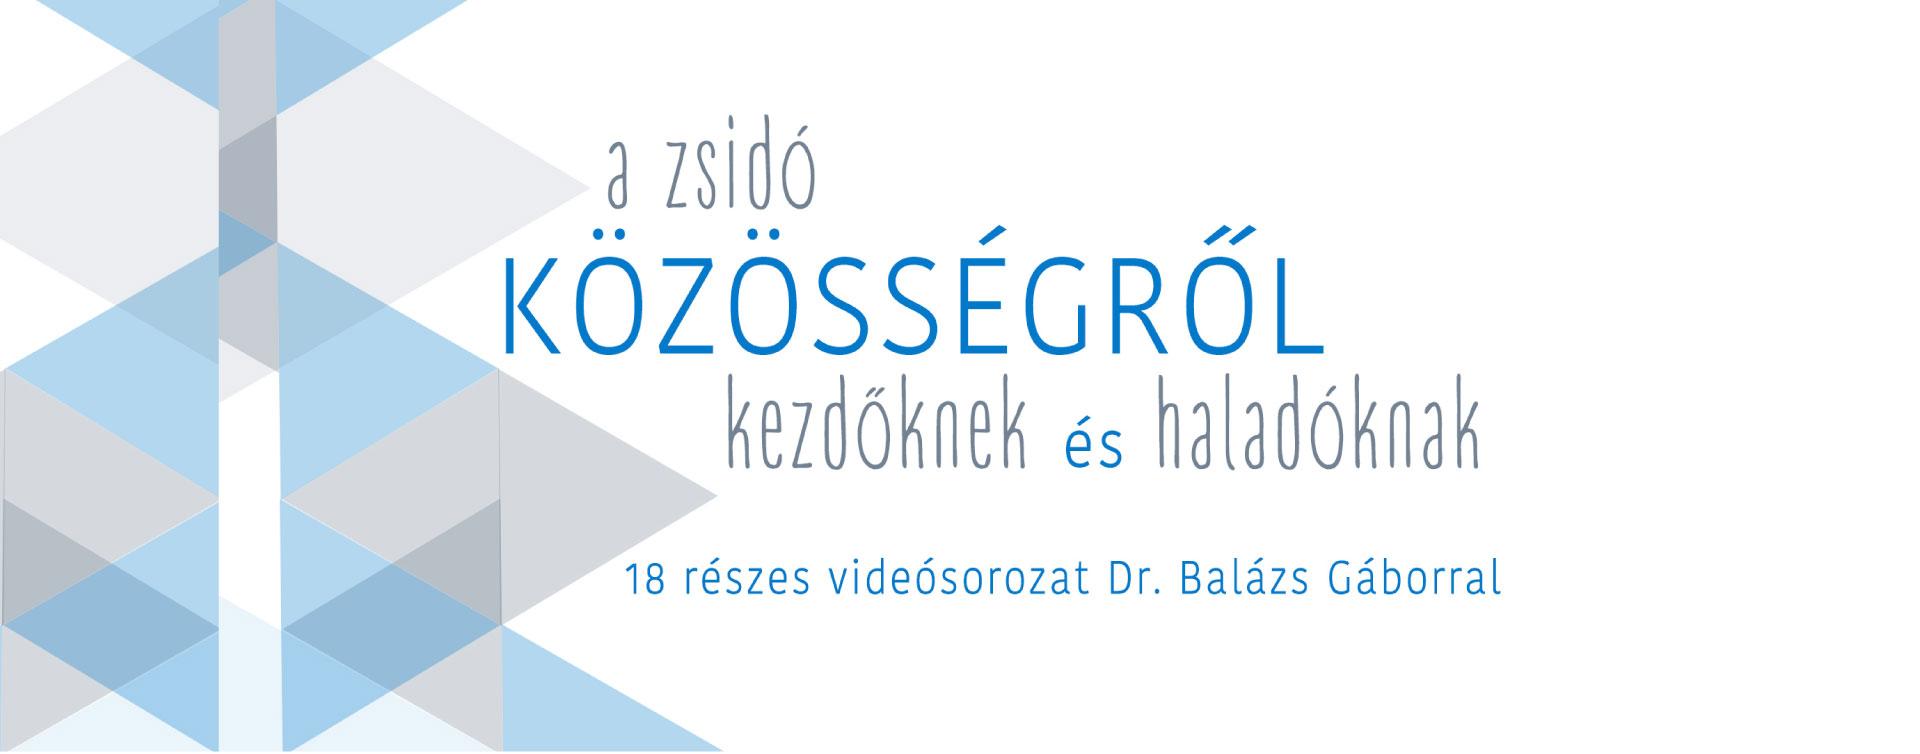 zsido_kozosseg_header_banner_1920x754px